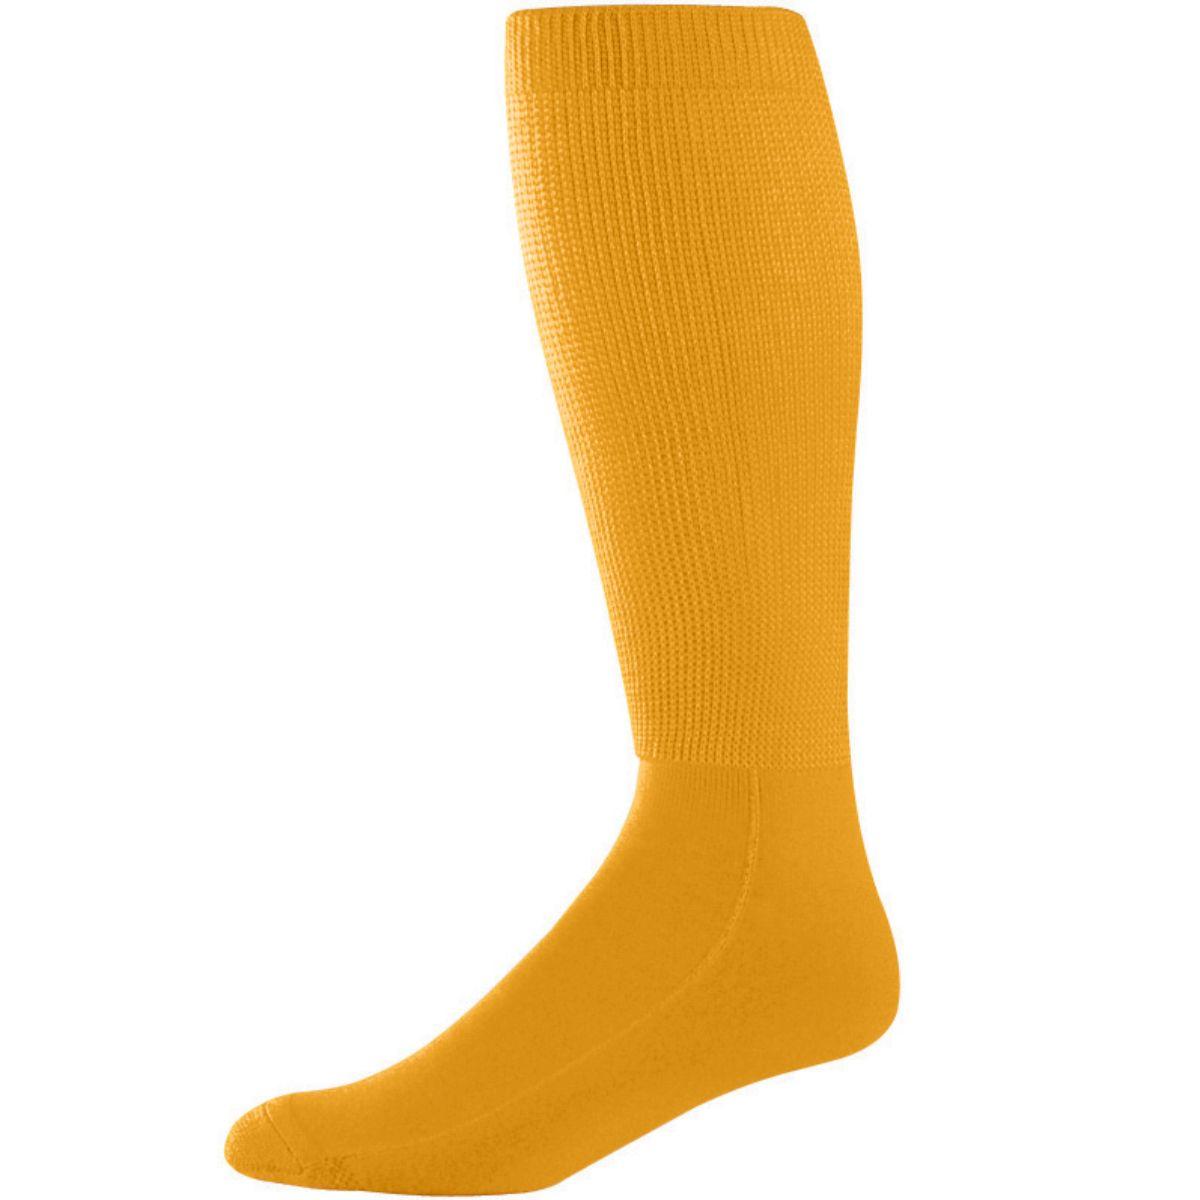 Augusta Wicking Athletic Socks (10-13) Gold 10-13 - image 1 de 1